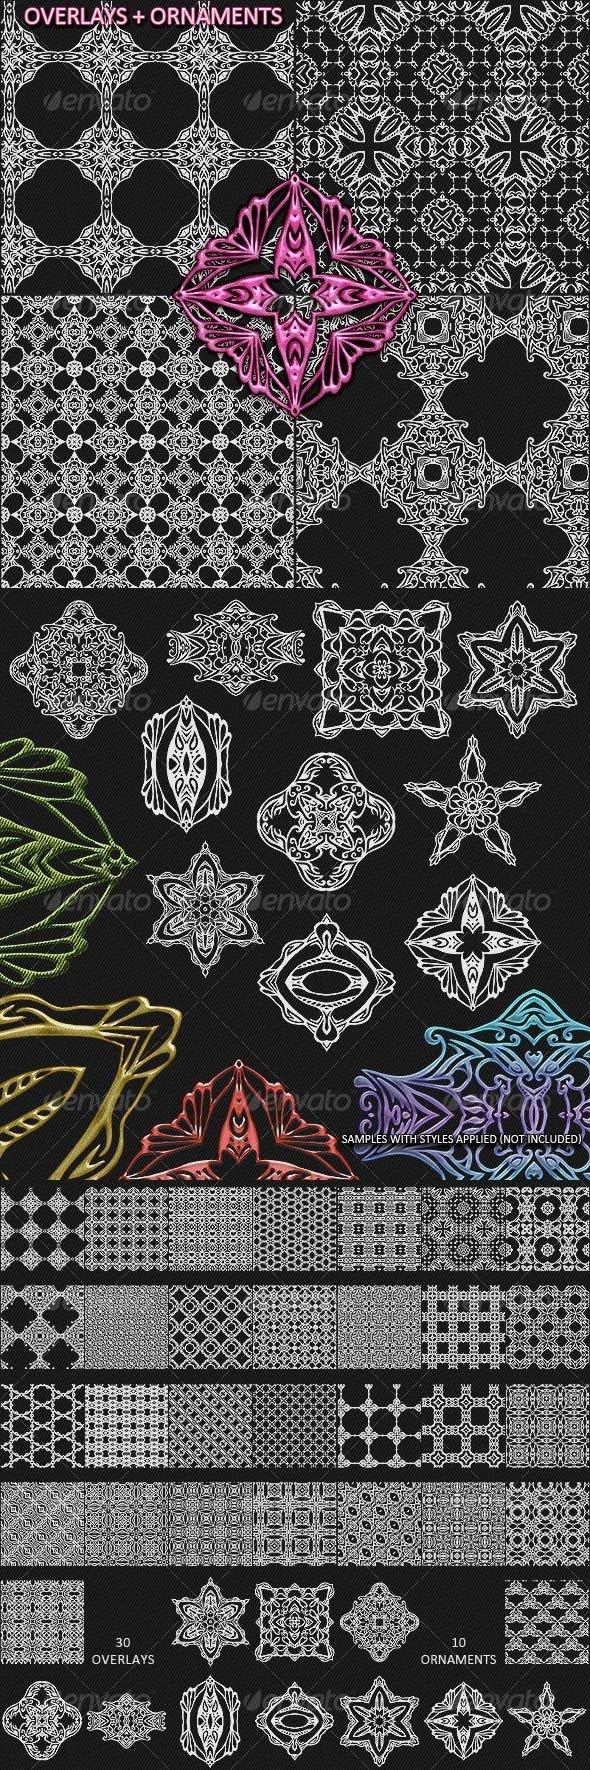 Decorlays - Seamless overlays + Ornaments - Patterns Decorative